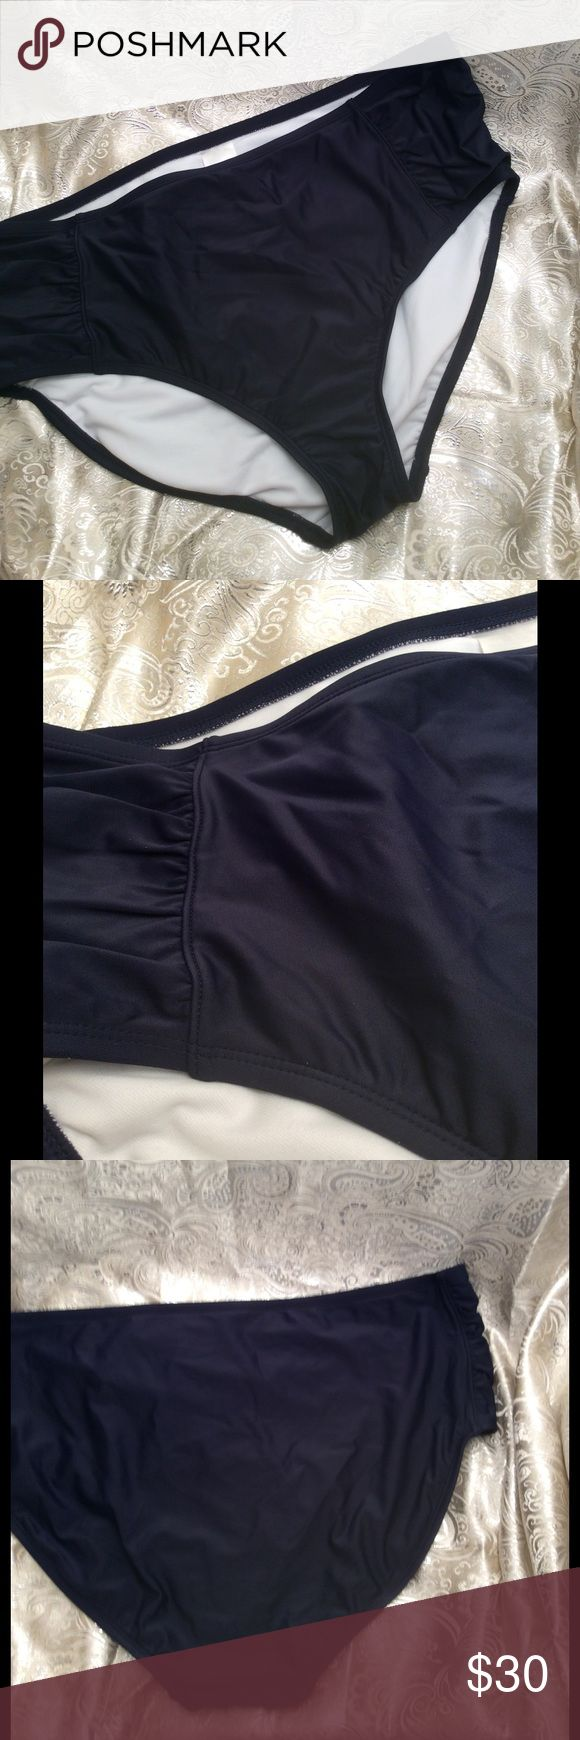 Ava & Viv navy blue full bikini brief nwot plus Ava & Viv women's plus size bikini bottom with side rouching. Navy blue, full coverage bottom. New without tags. Size 20/22. ** coordinating pieces in separate listing Ava & Viv Swim Bikinis